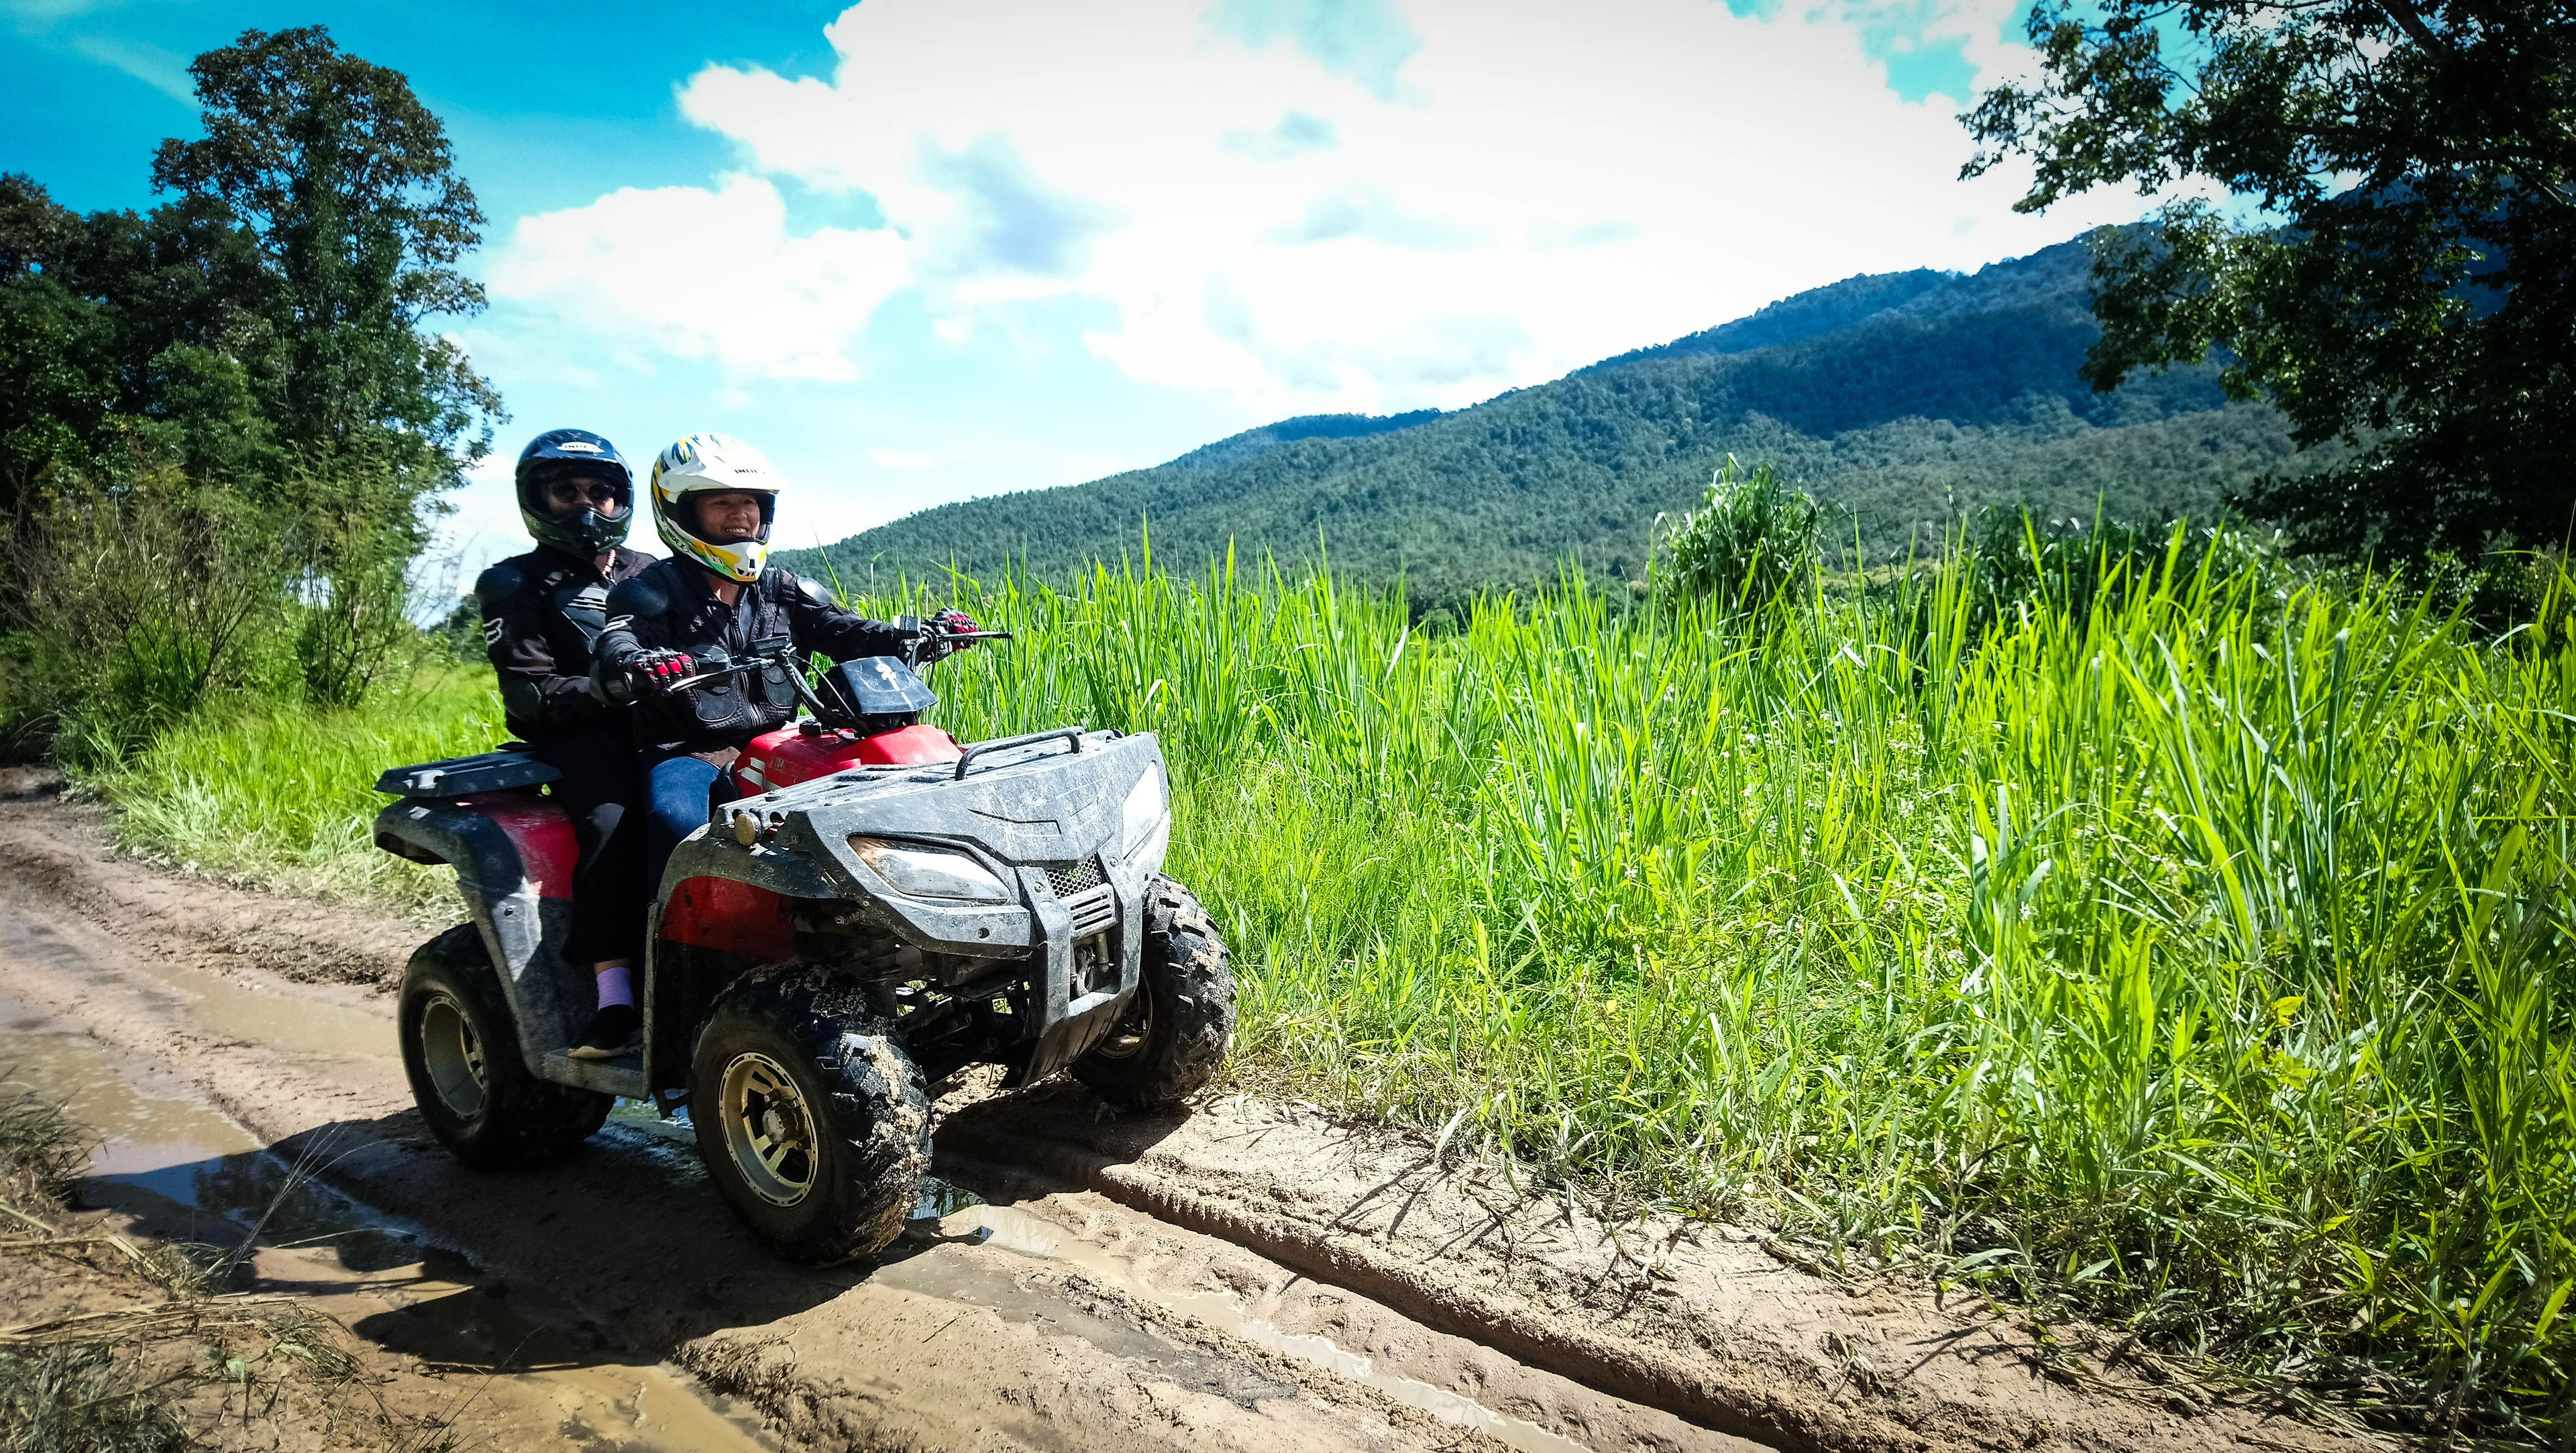 X-1 Jungle Excursion ATV 1 hour at Huay Tung Tao